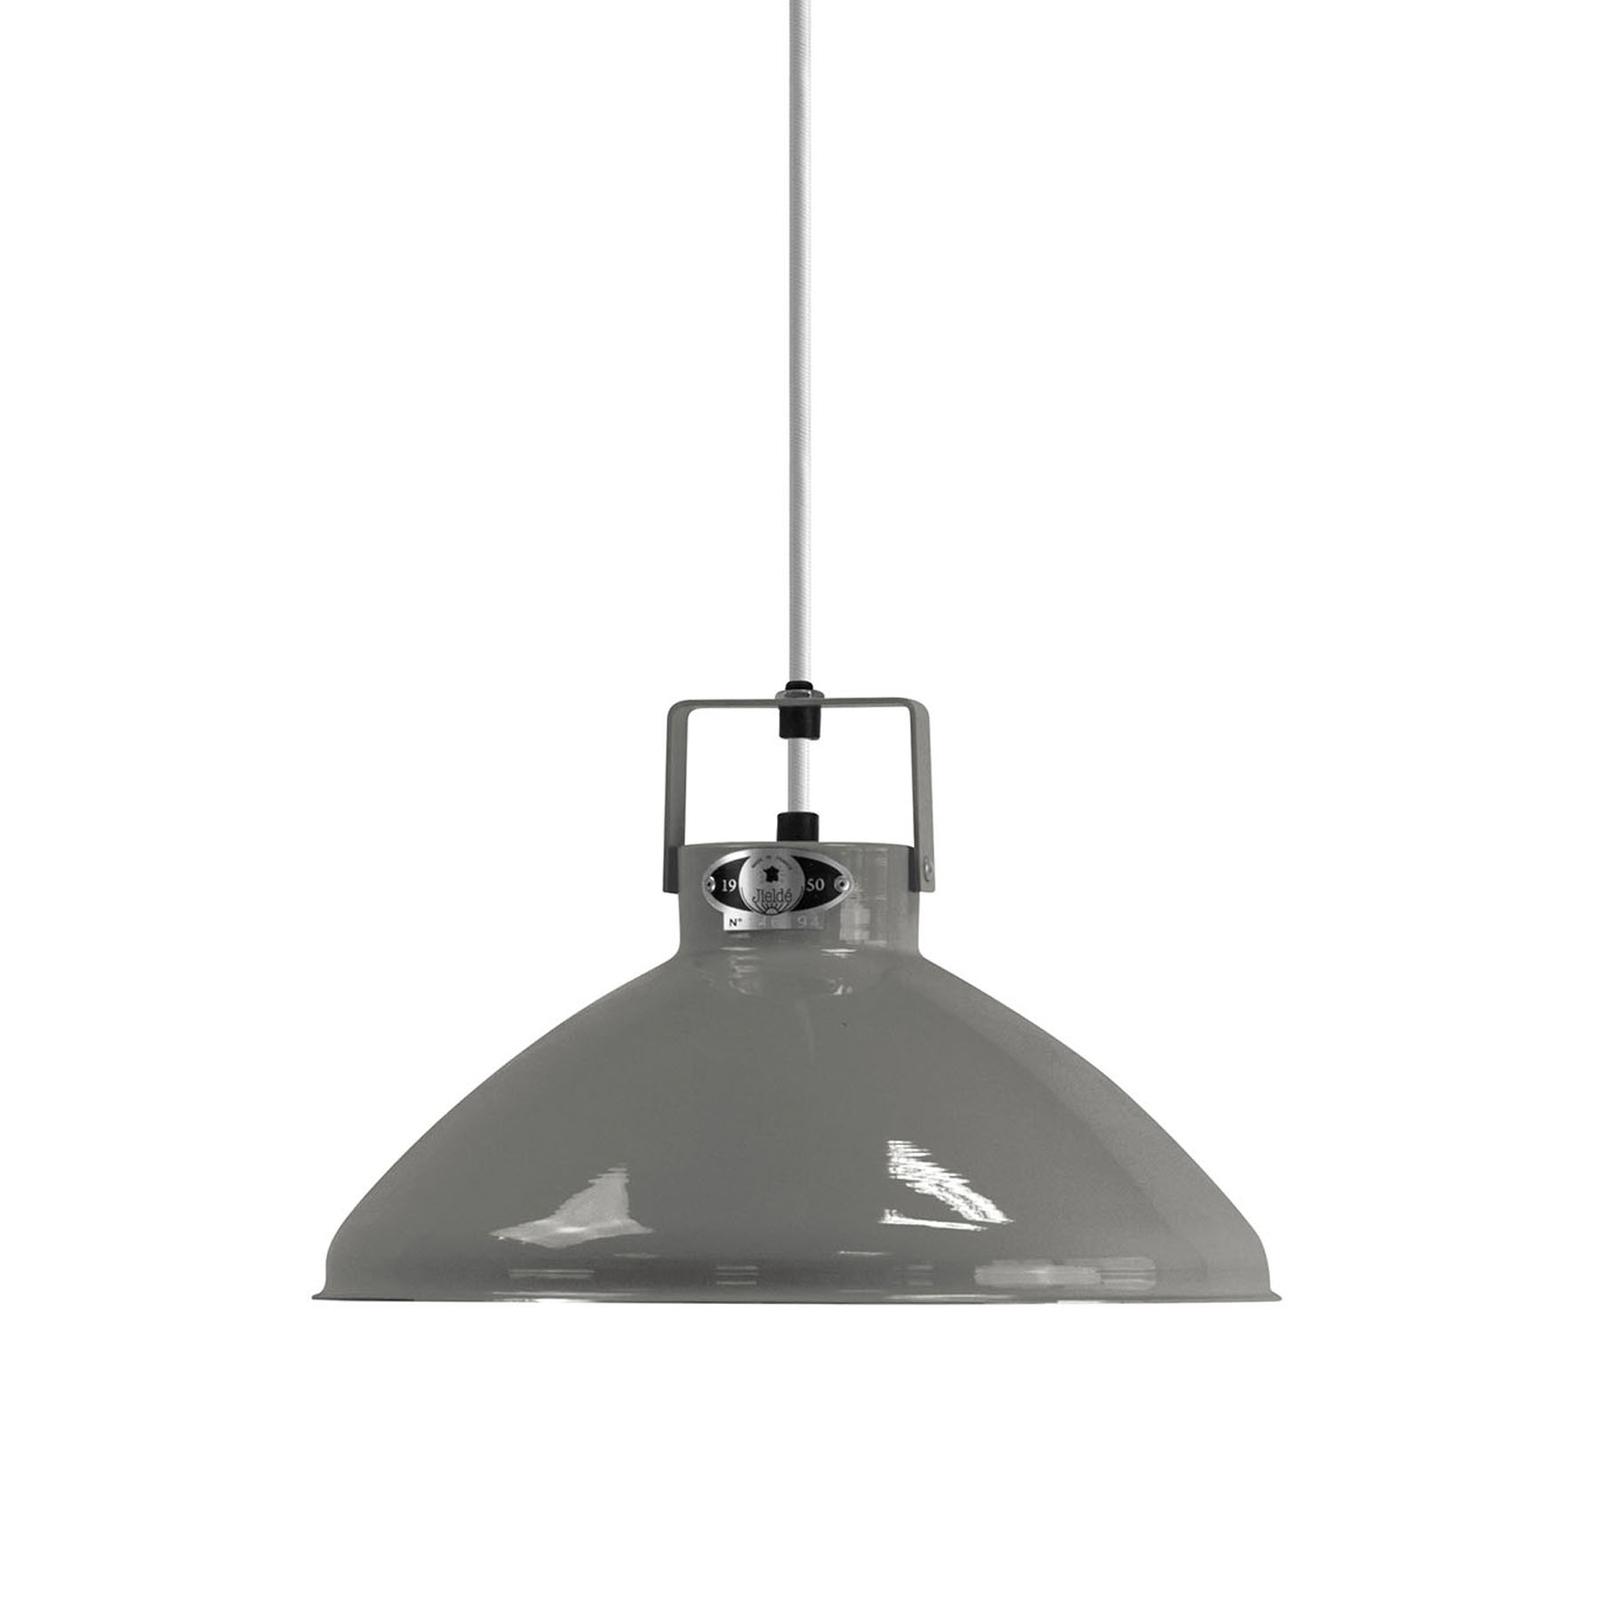 Jieldé Beaumont B240 hængelampe, blank grå